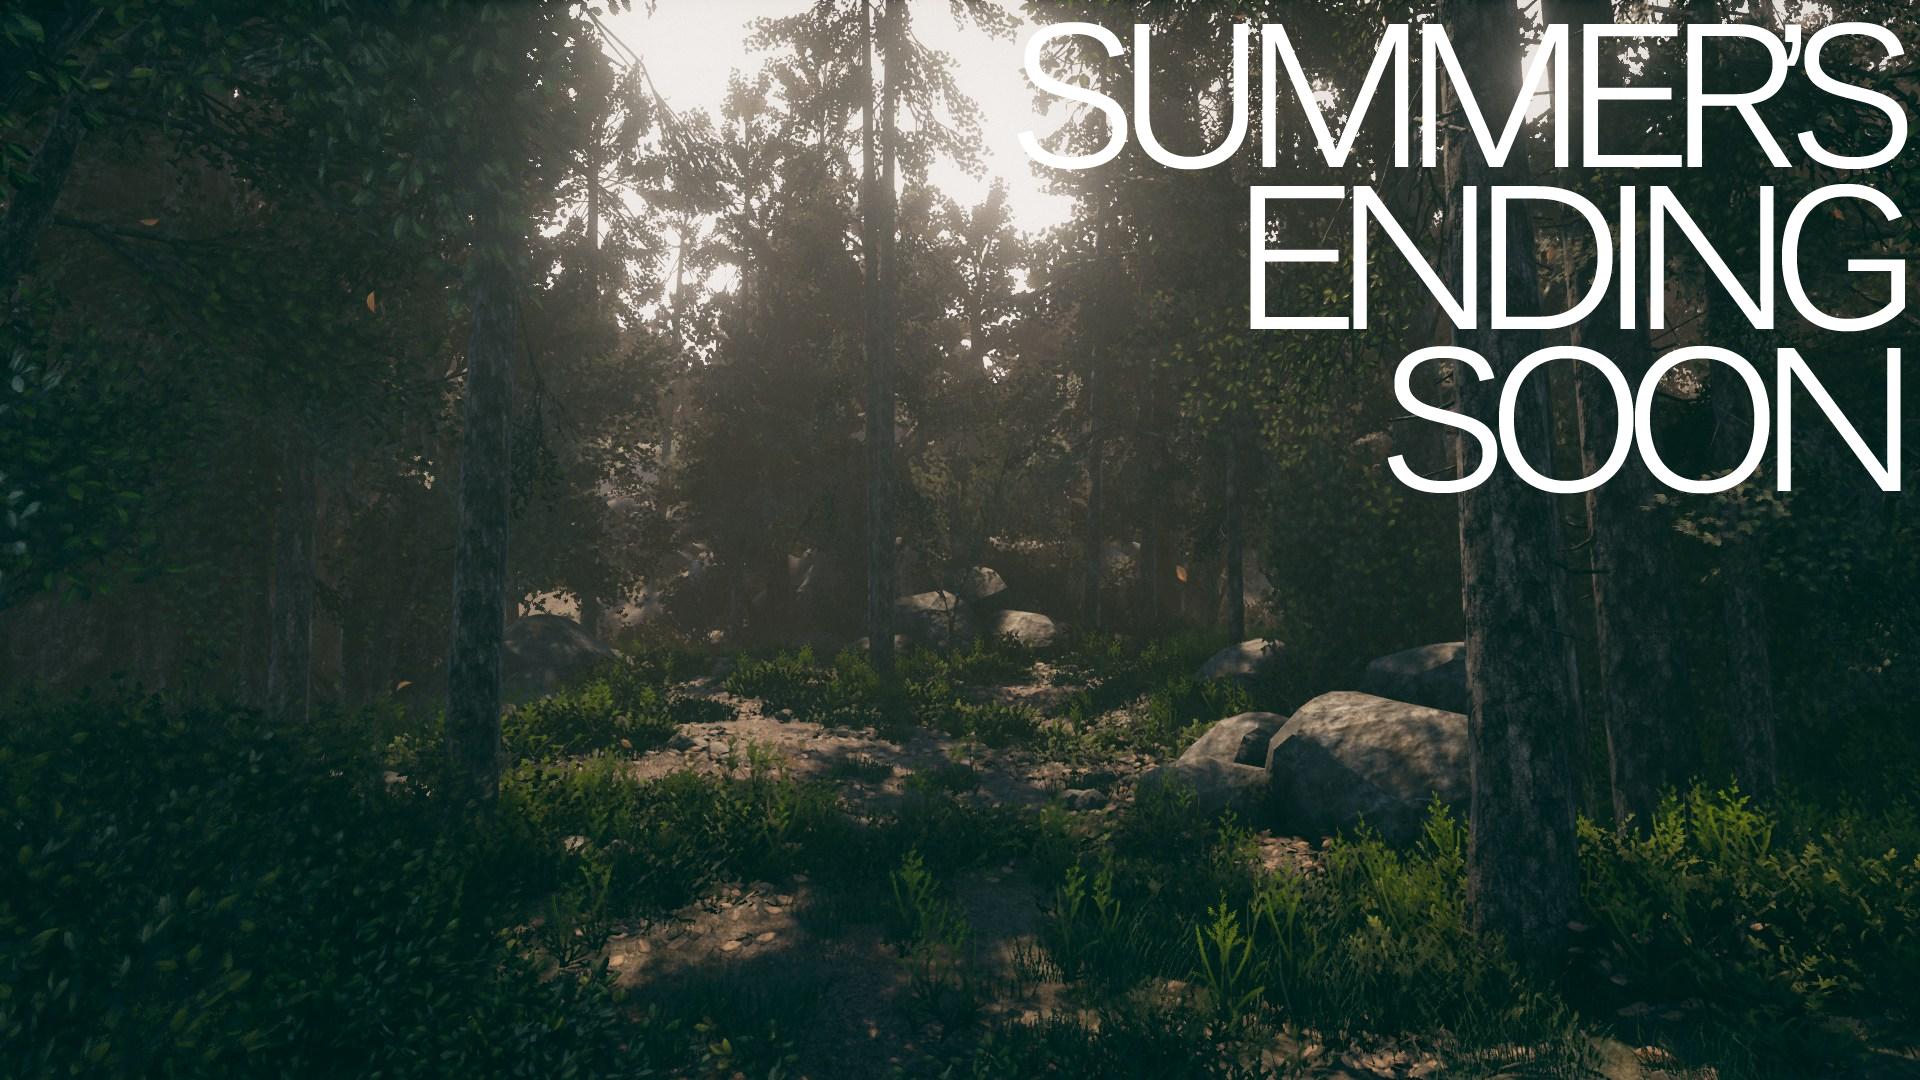 Summer's Ending Soon